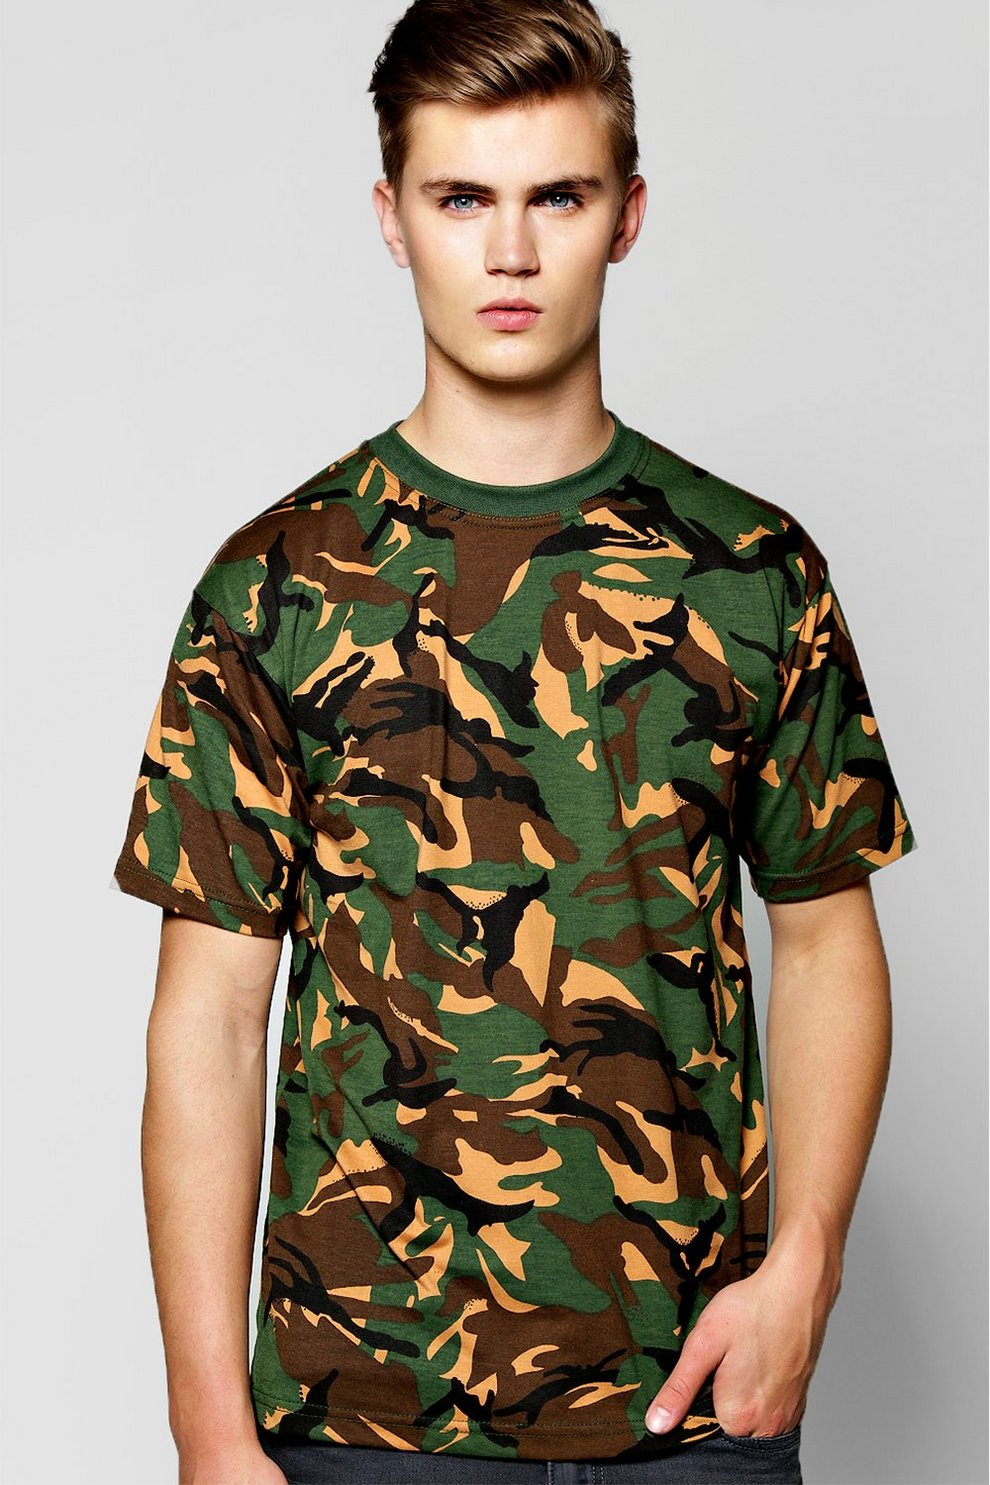 db9cb540 Loose Fit Camo Print T-Shirt - boohooMAN